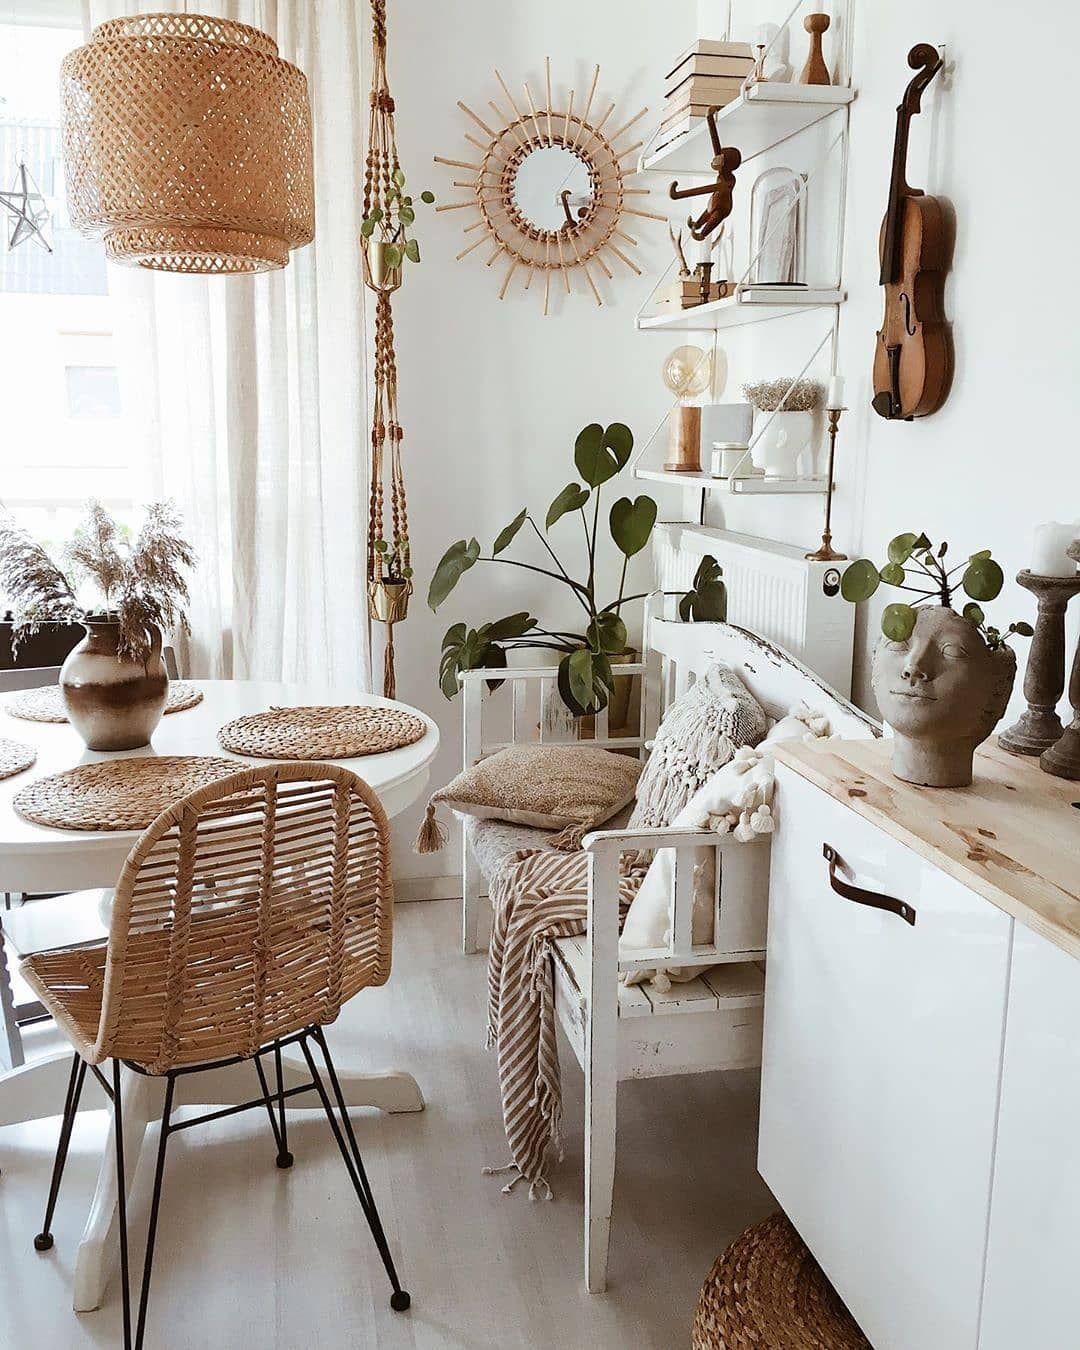 #dinningroom #homedcorate #dinninroomdesign #homedesign #homedecor #naturalhomedesign